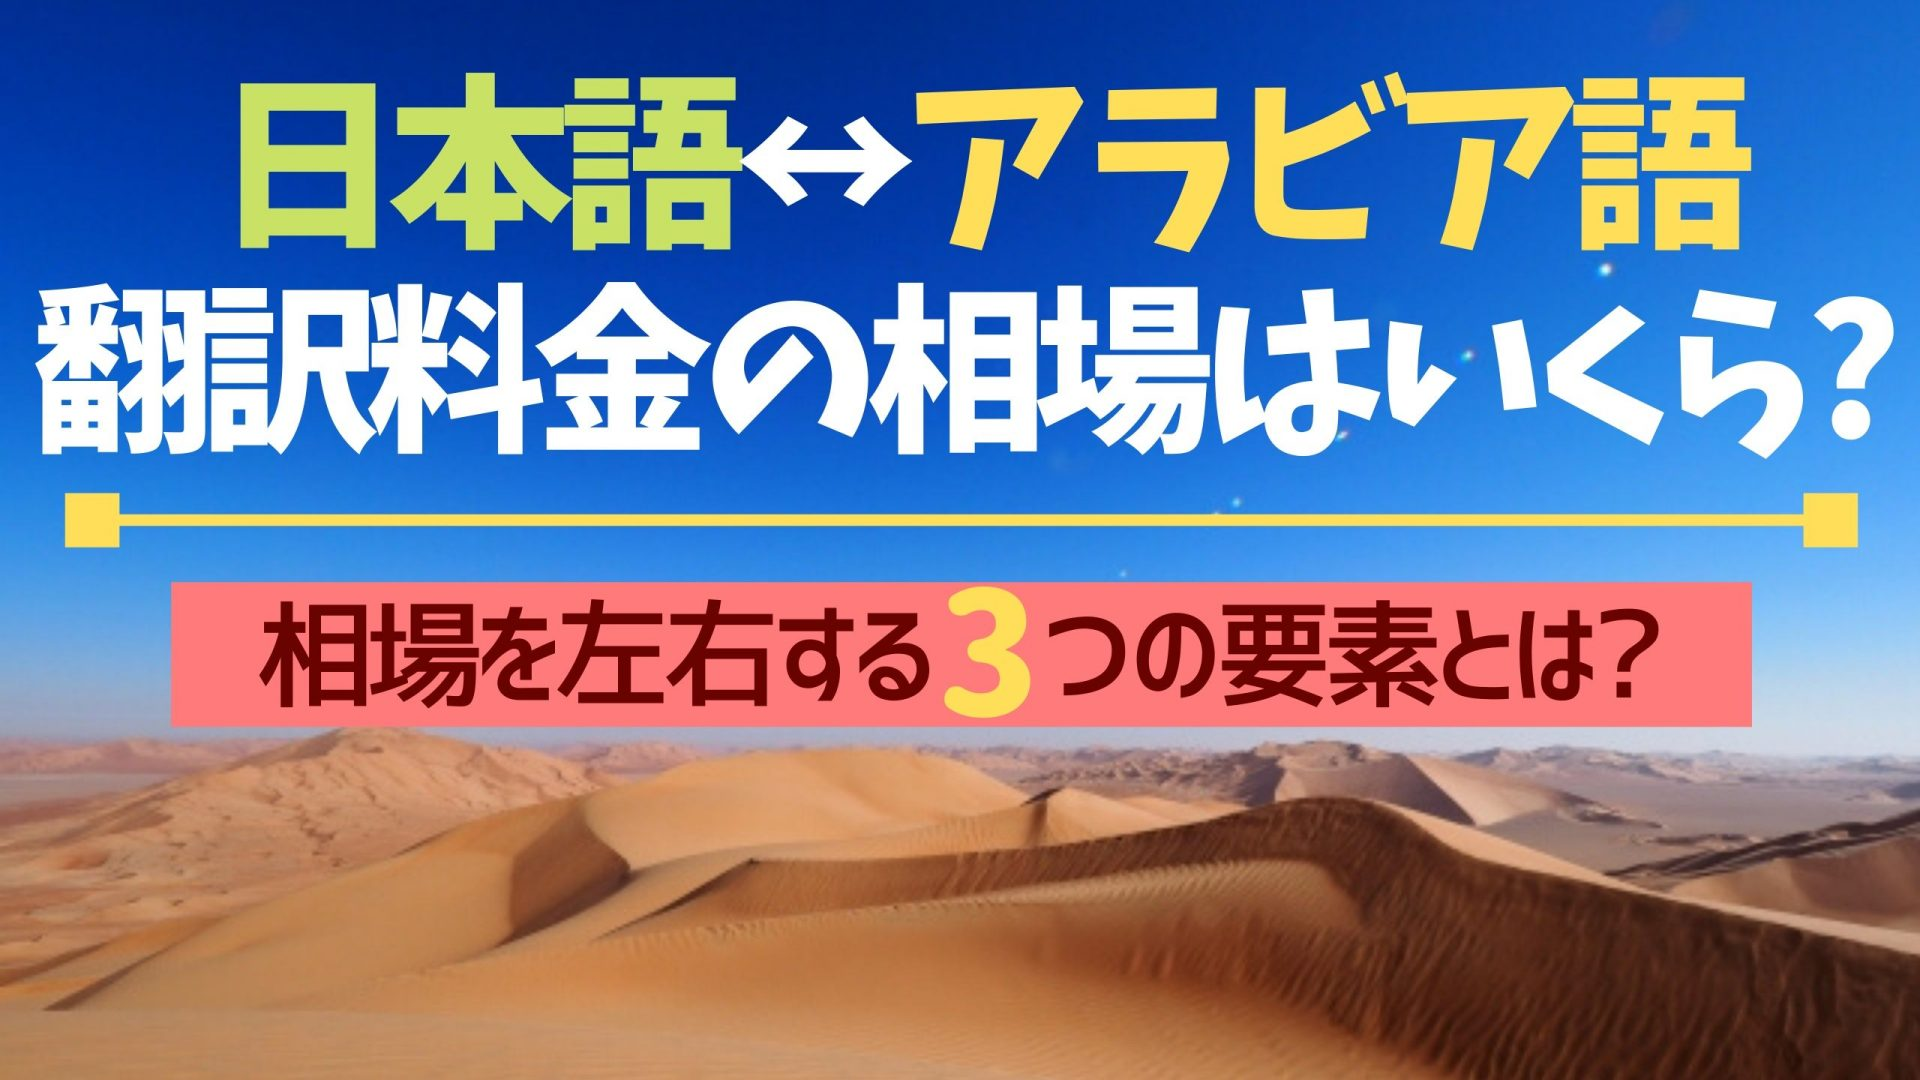 a0582eb17ac24386efe0675b28f07eb1 - 日本語からアラビア語、アラビア語から日本語への翻訳料金の相場は?